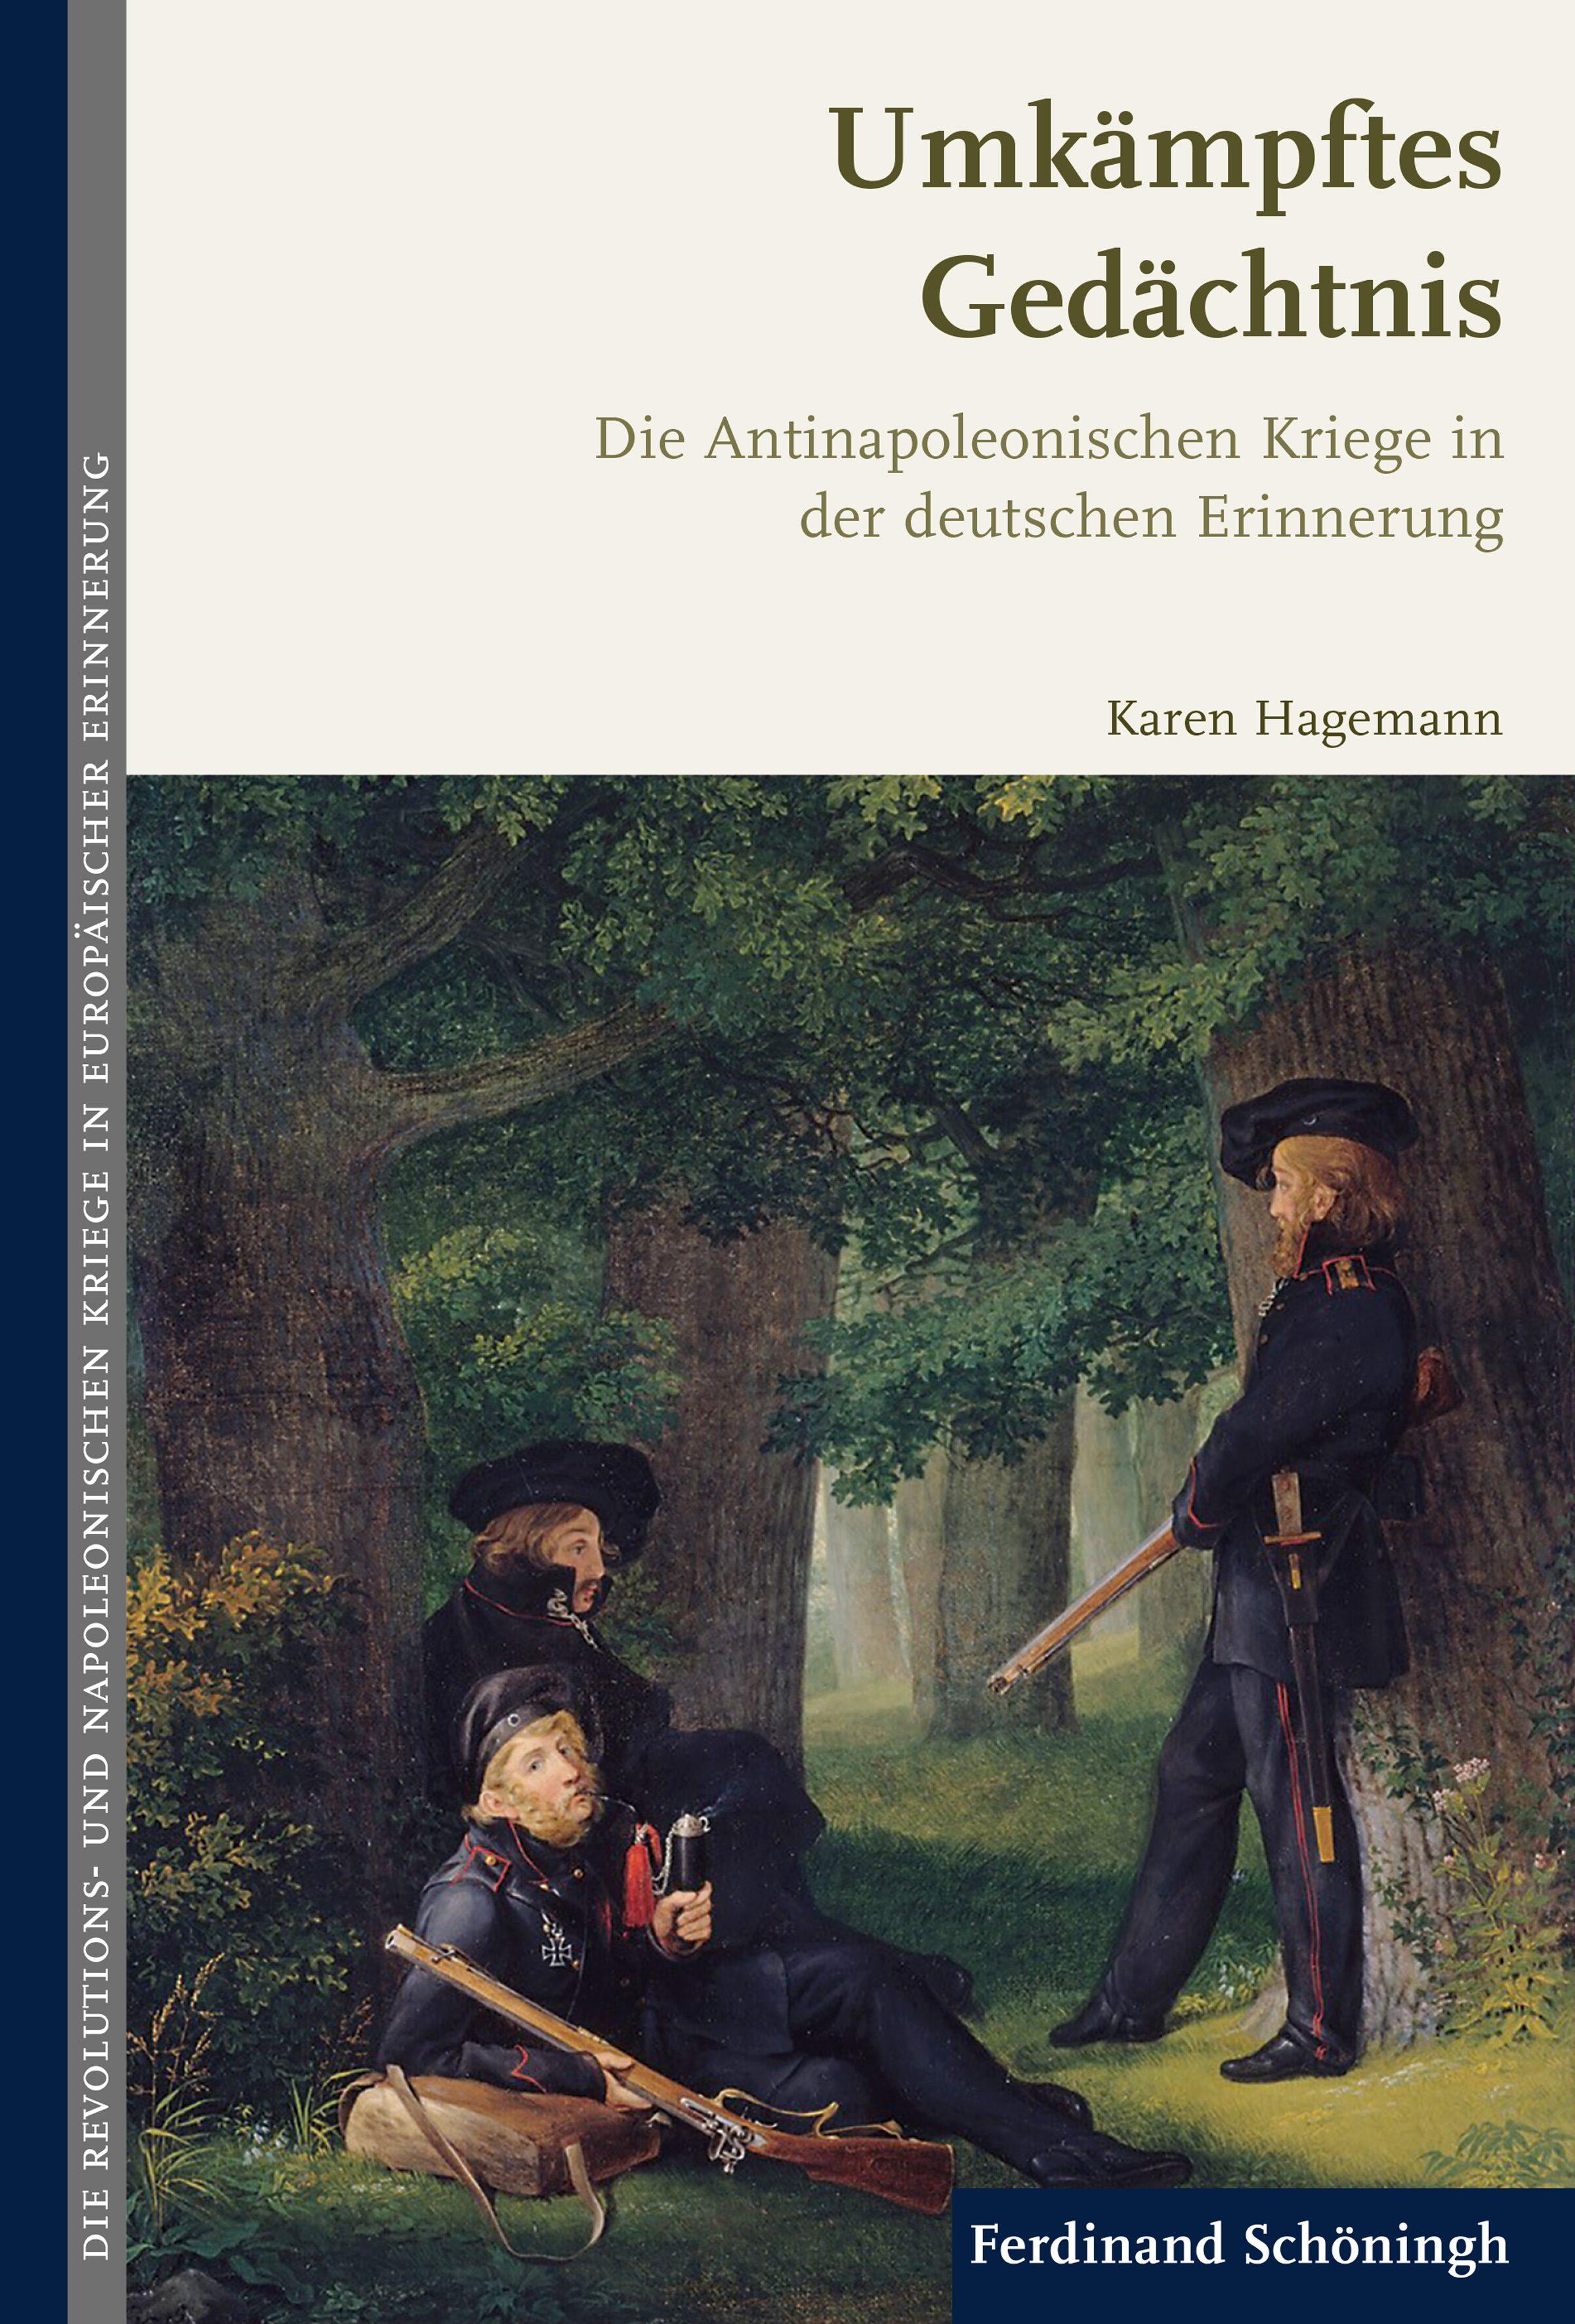 Haltefeder HANS PRIES 109 633